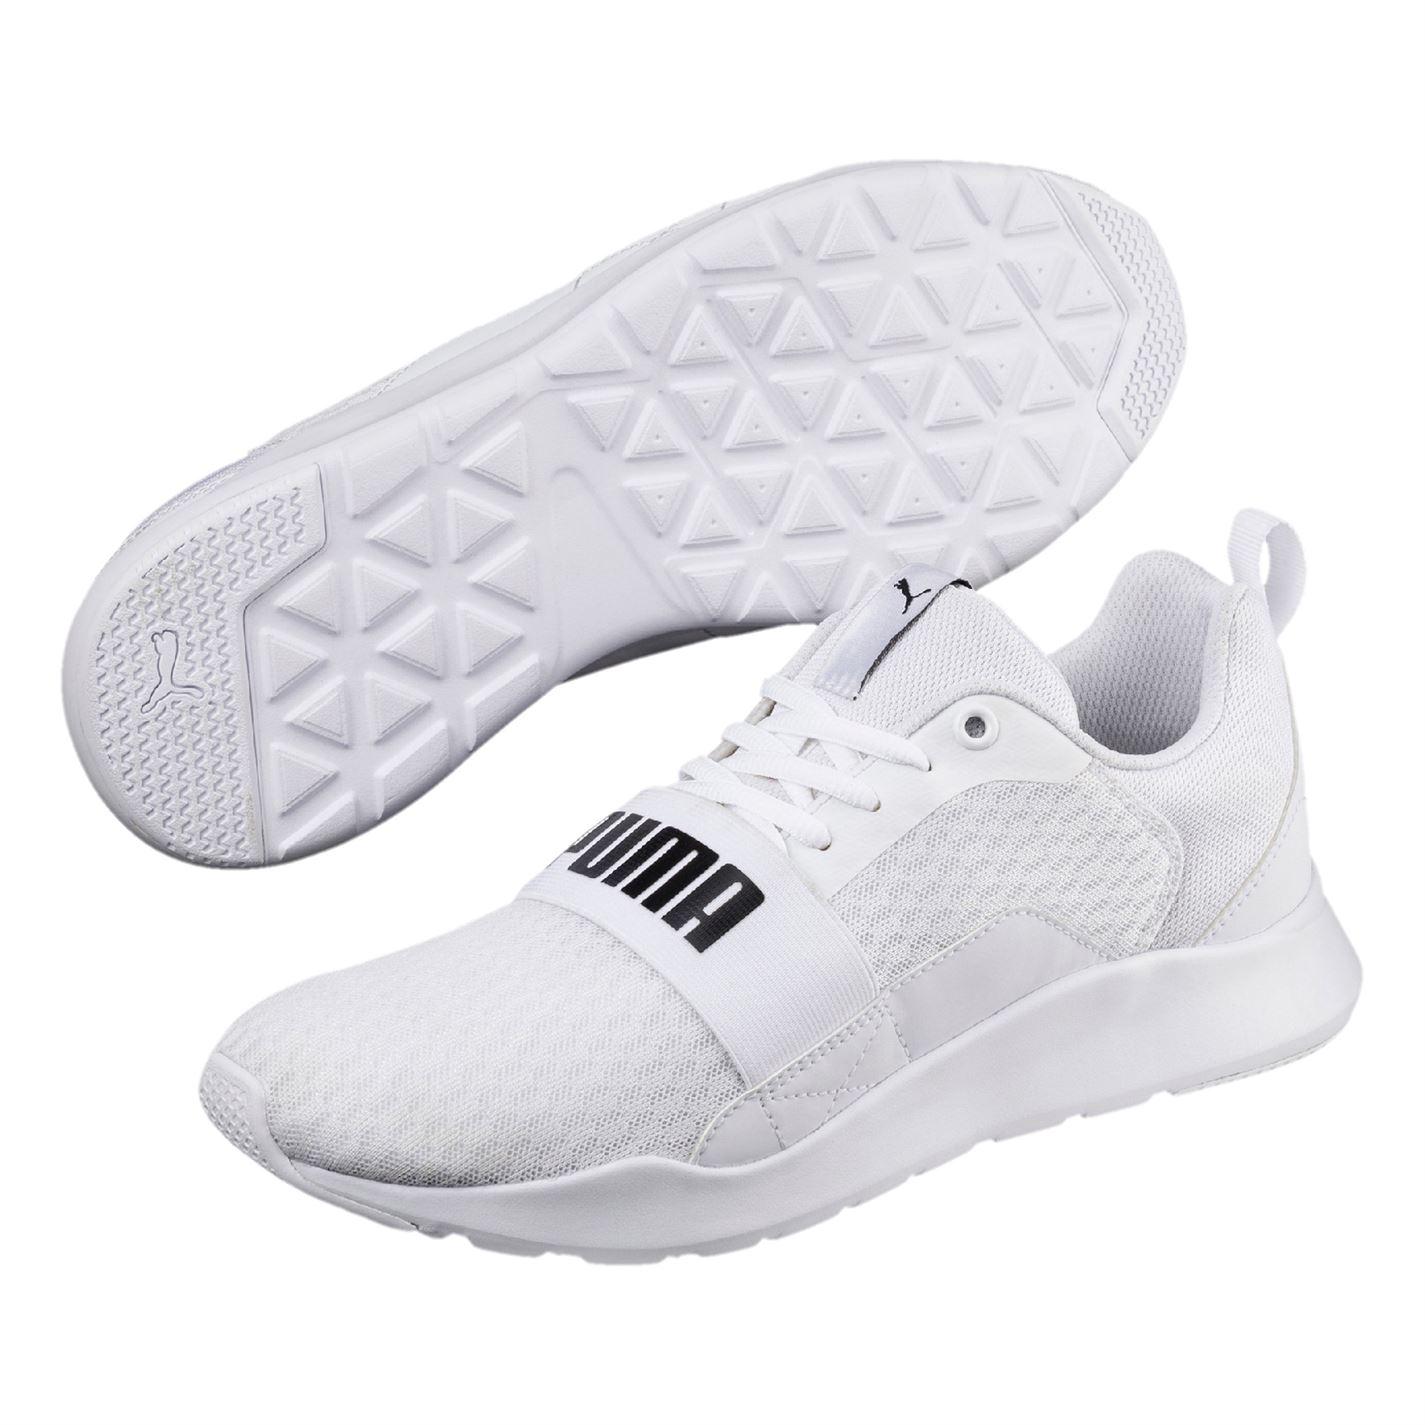 separation shoes 156cc 5f5a6 Puma-cablata-Scarpe-da-ginnastica-Uomo-Gents-corridori-